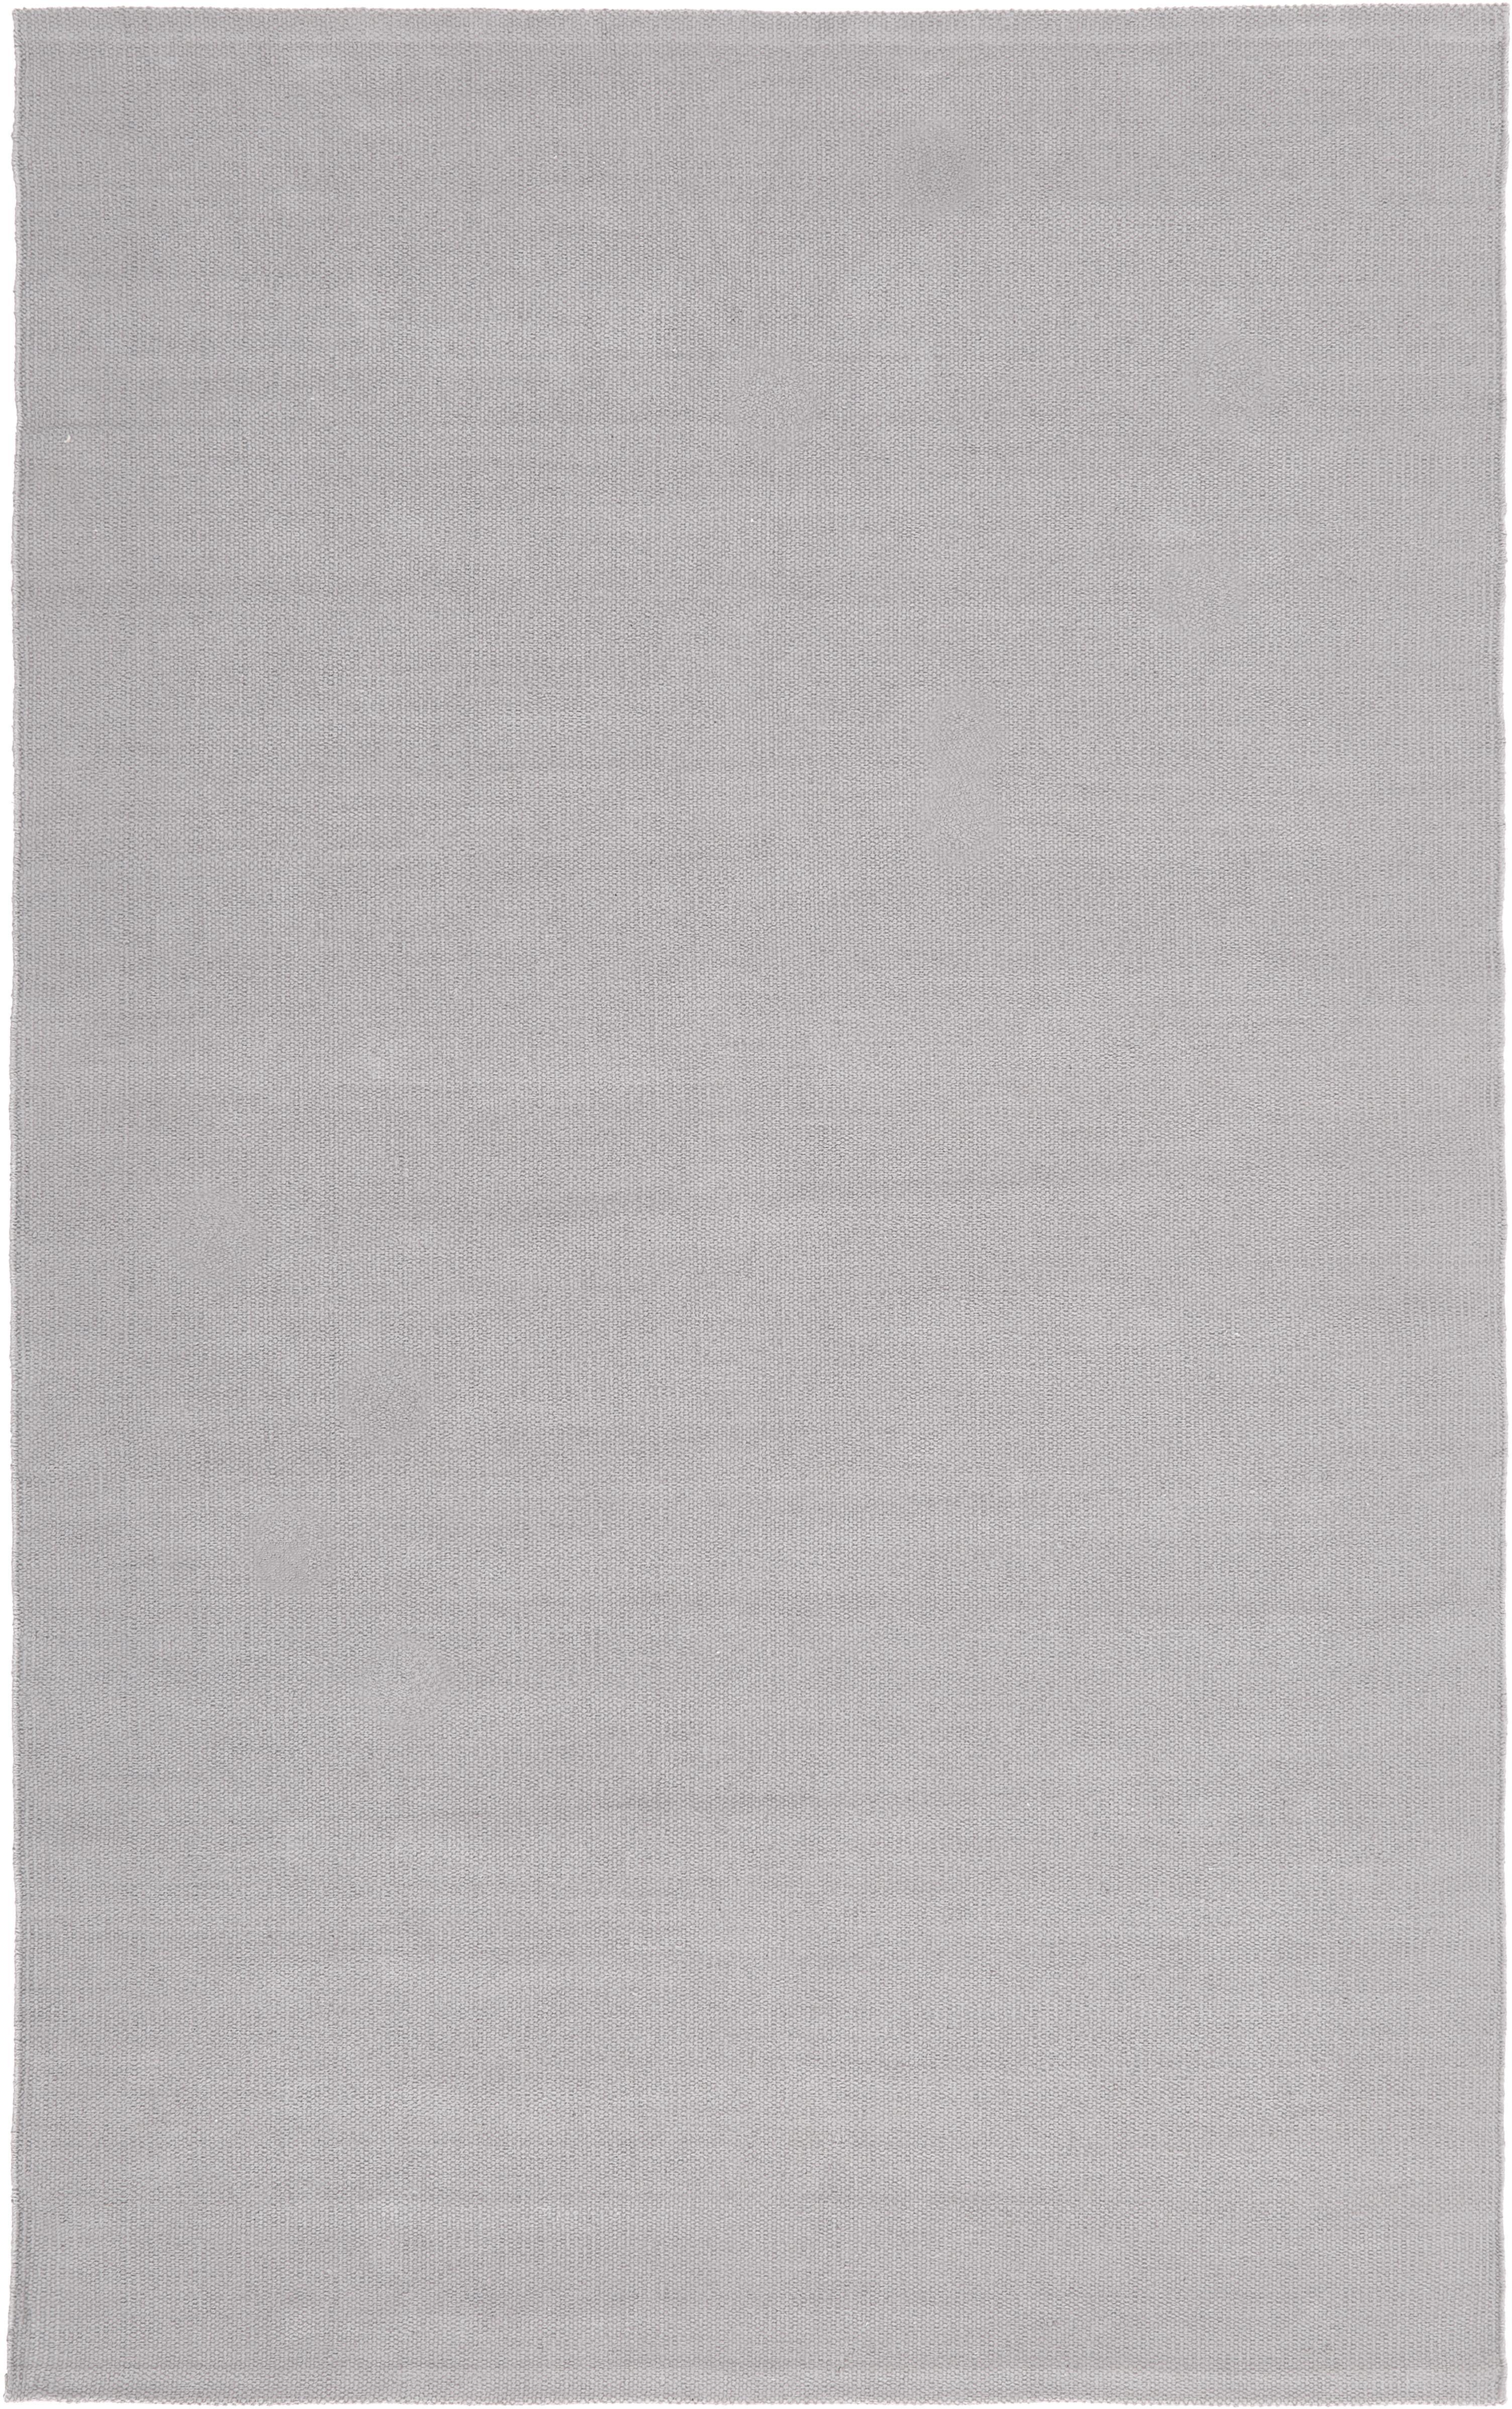 Handgeweven katoenen vloerkleed Agneta, 100% katoen, Grijs, B 50 x L 80 cm (maat XXS)